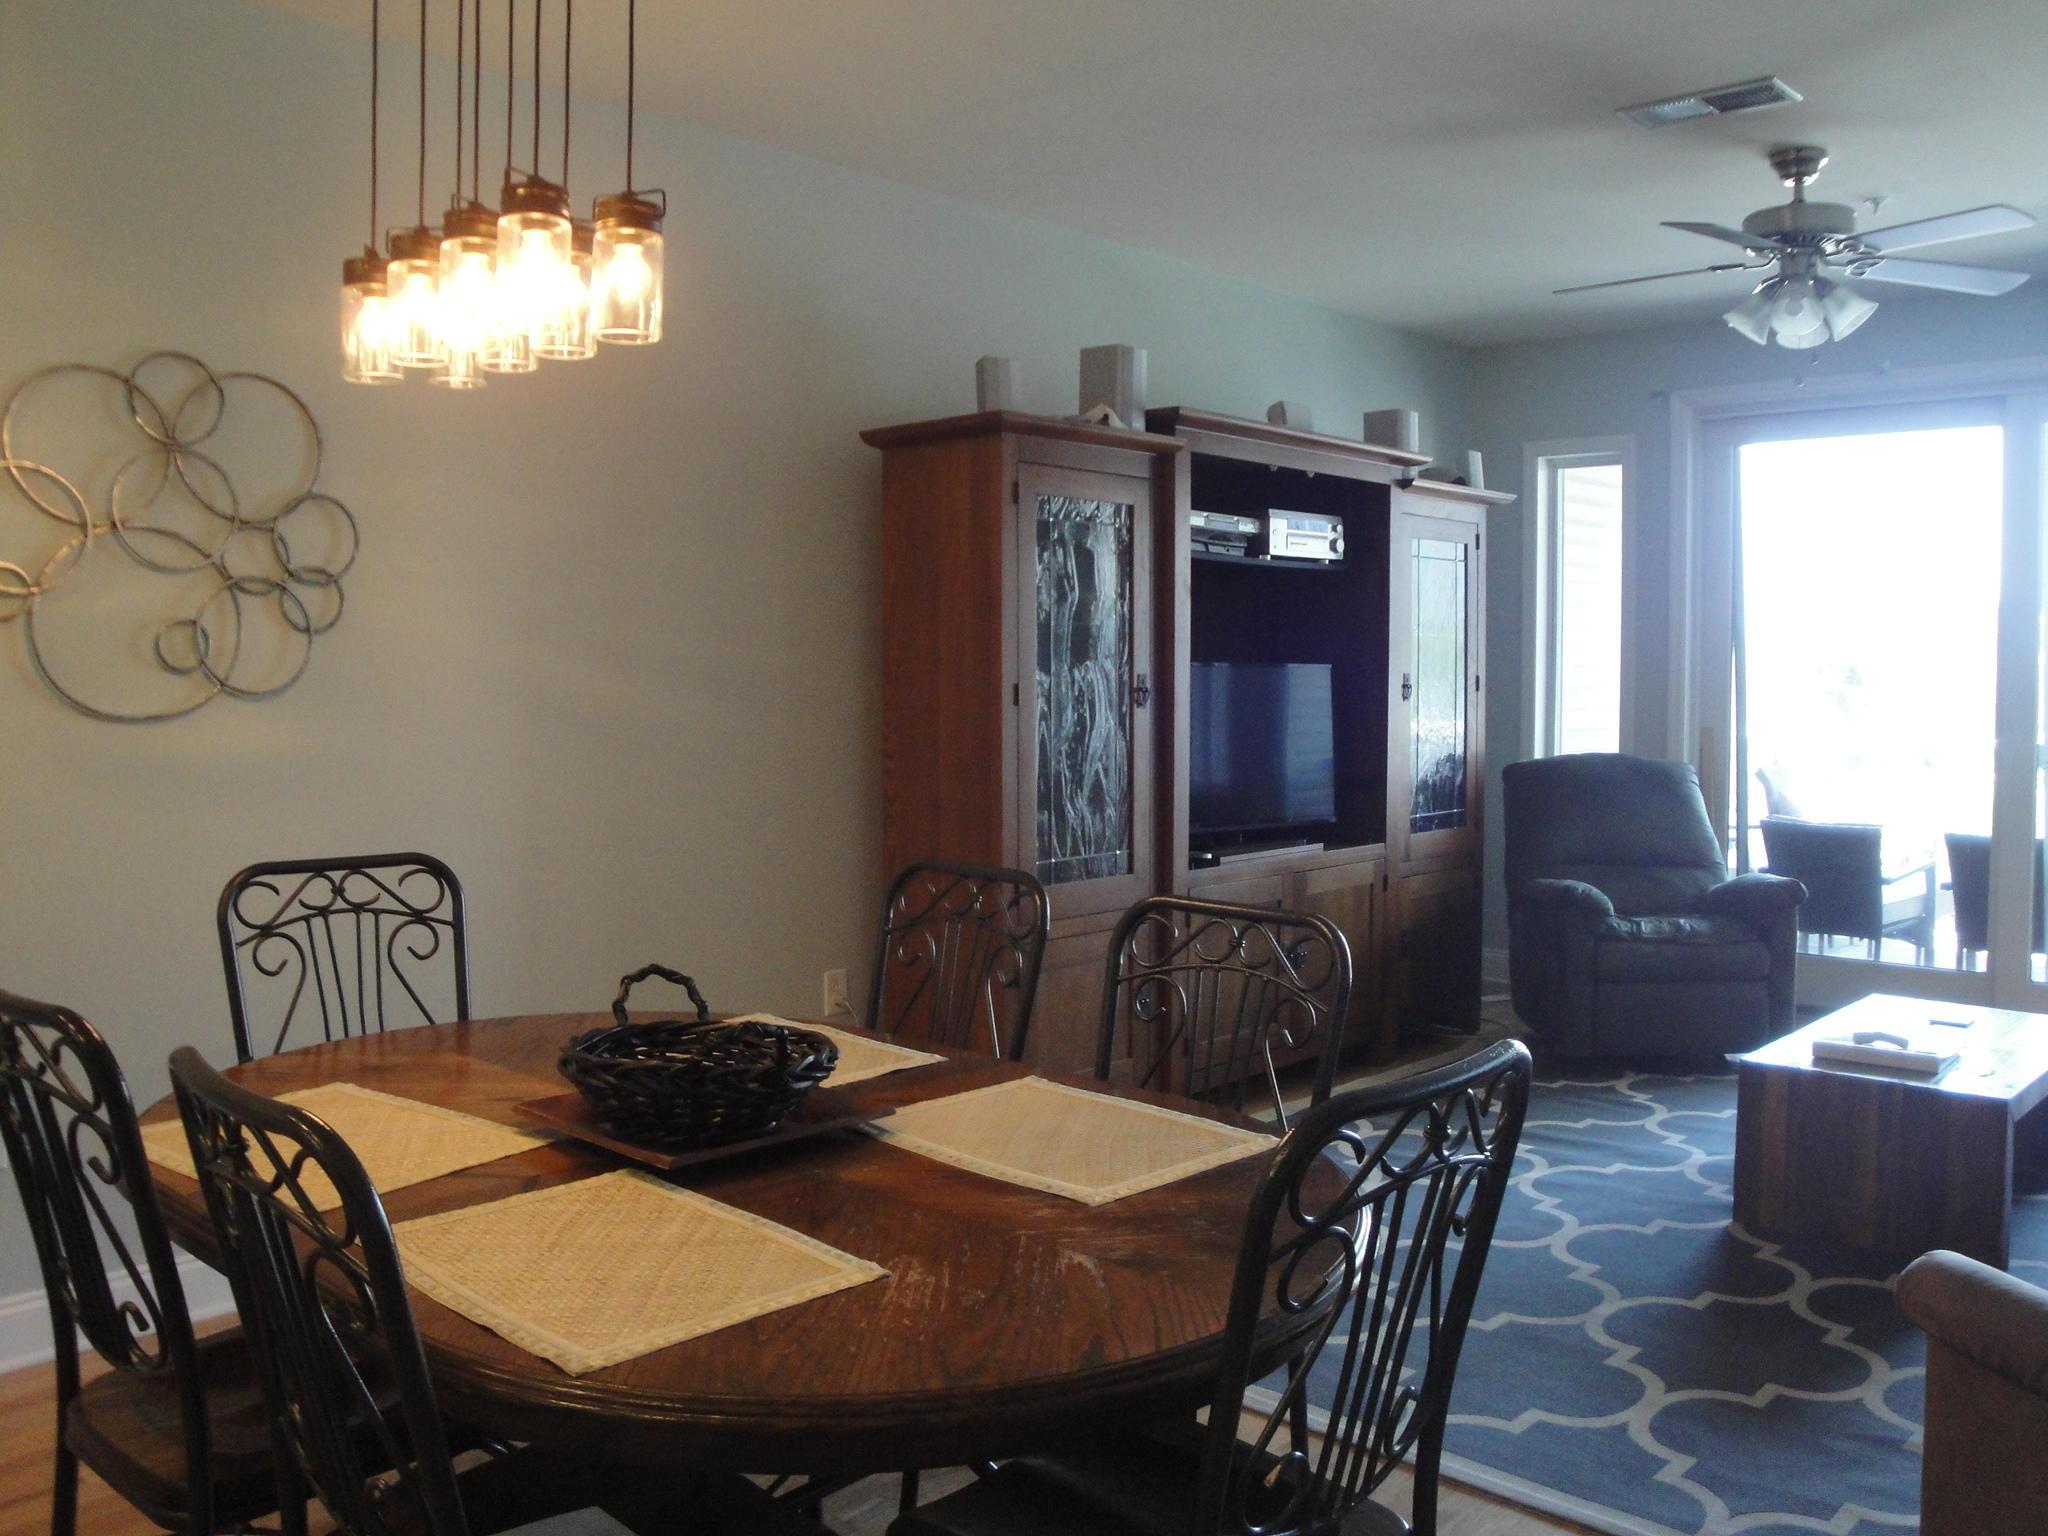 Pier Pointe Villas Homes For Sale - 117 Ashley, Folly Beach, SC - 13